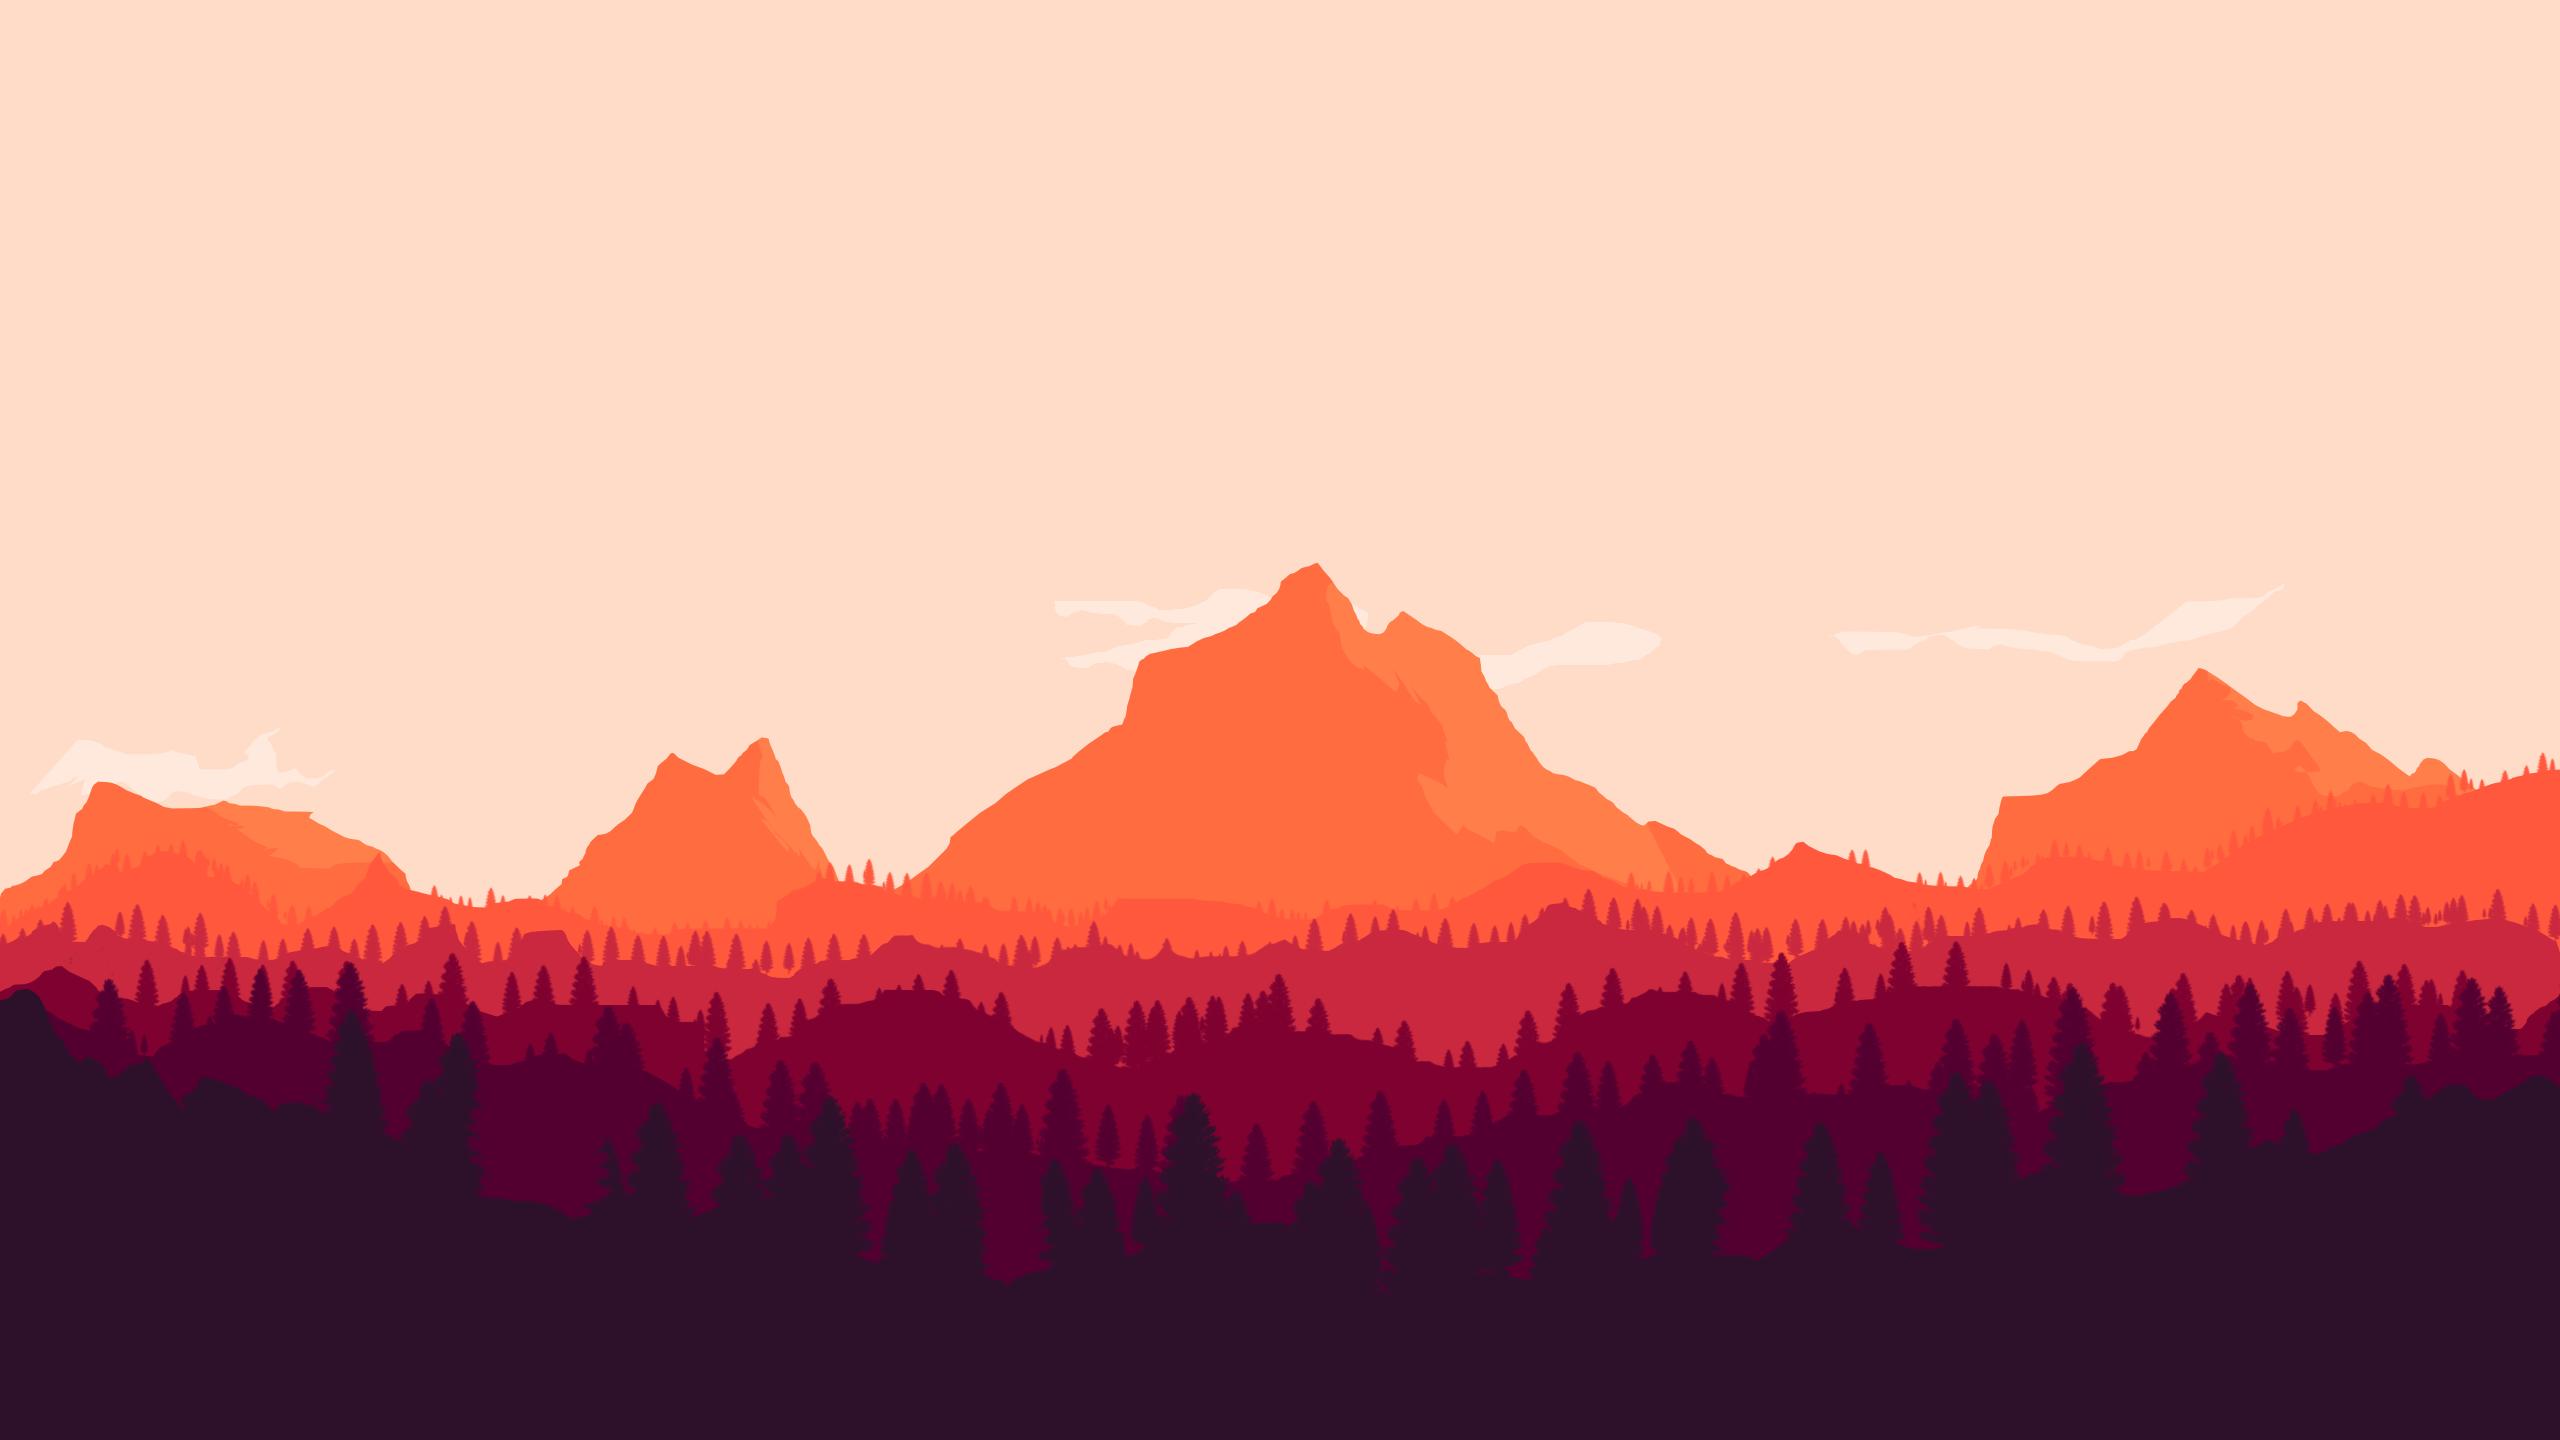 Great Wallpaper Mountain Minimalistic - mountain_desktop_by_xana_seraphi-d8d27ev  Gallery_518186.png